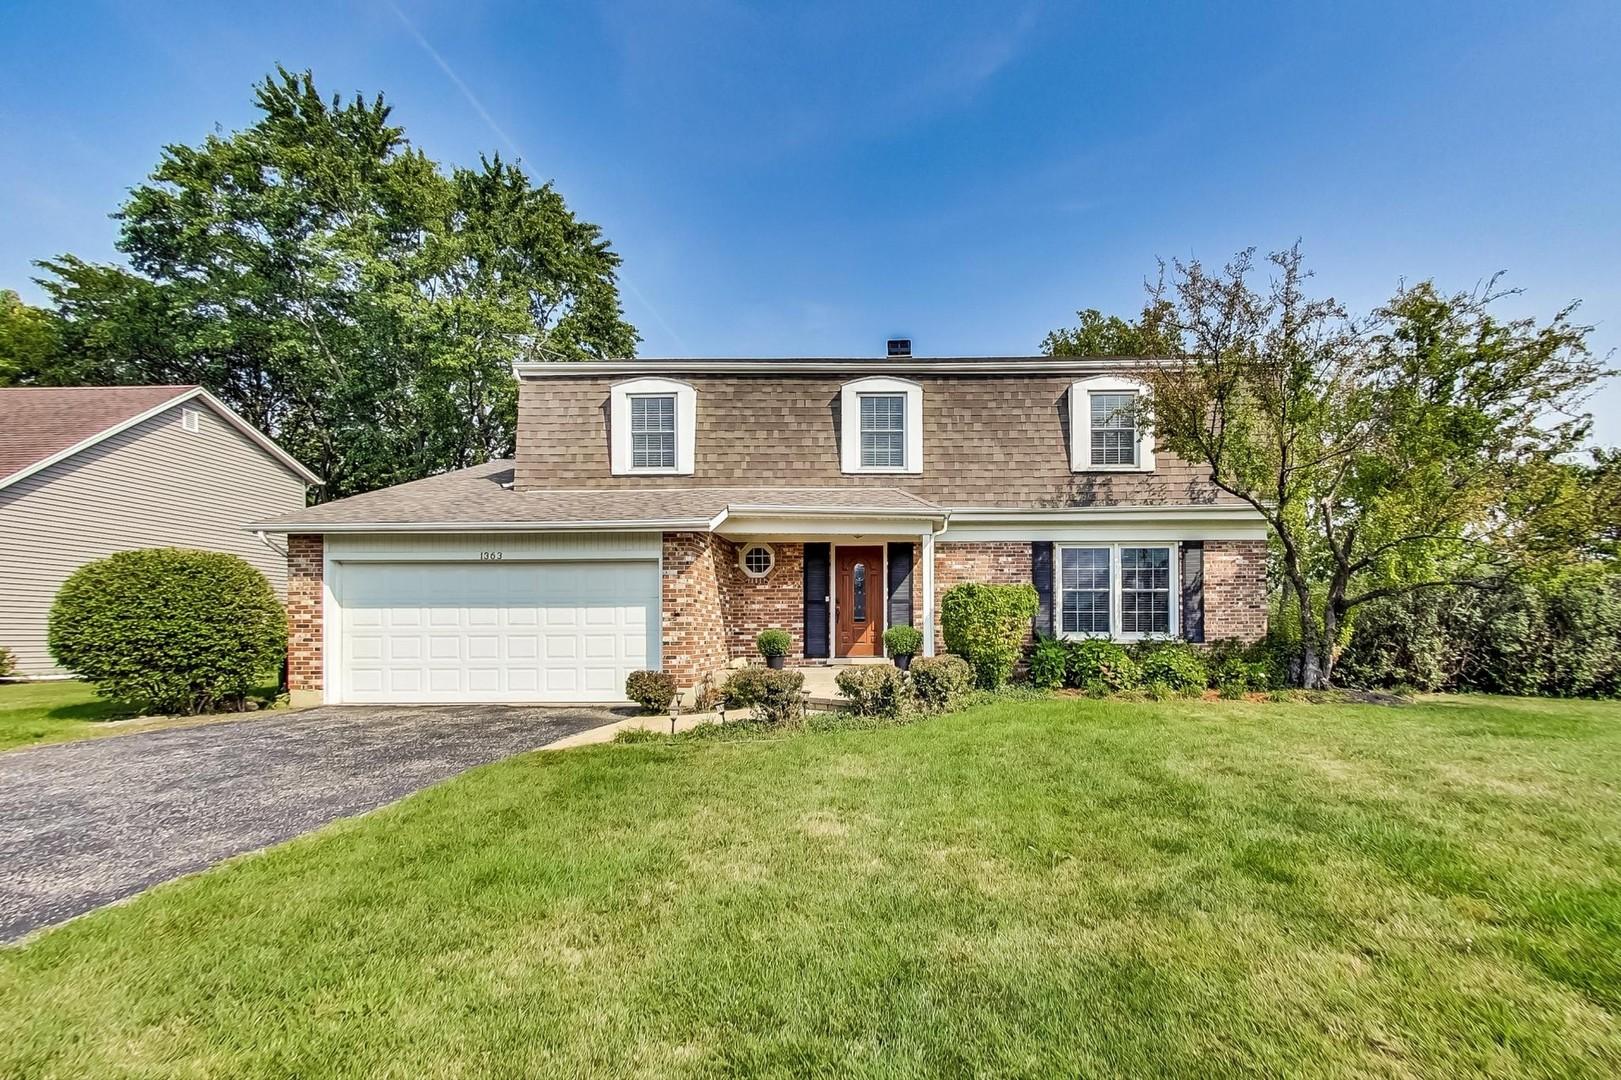 1363 Landwehr Road, Northbrook, IL 60062